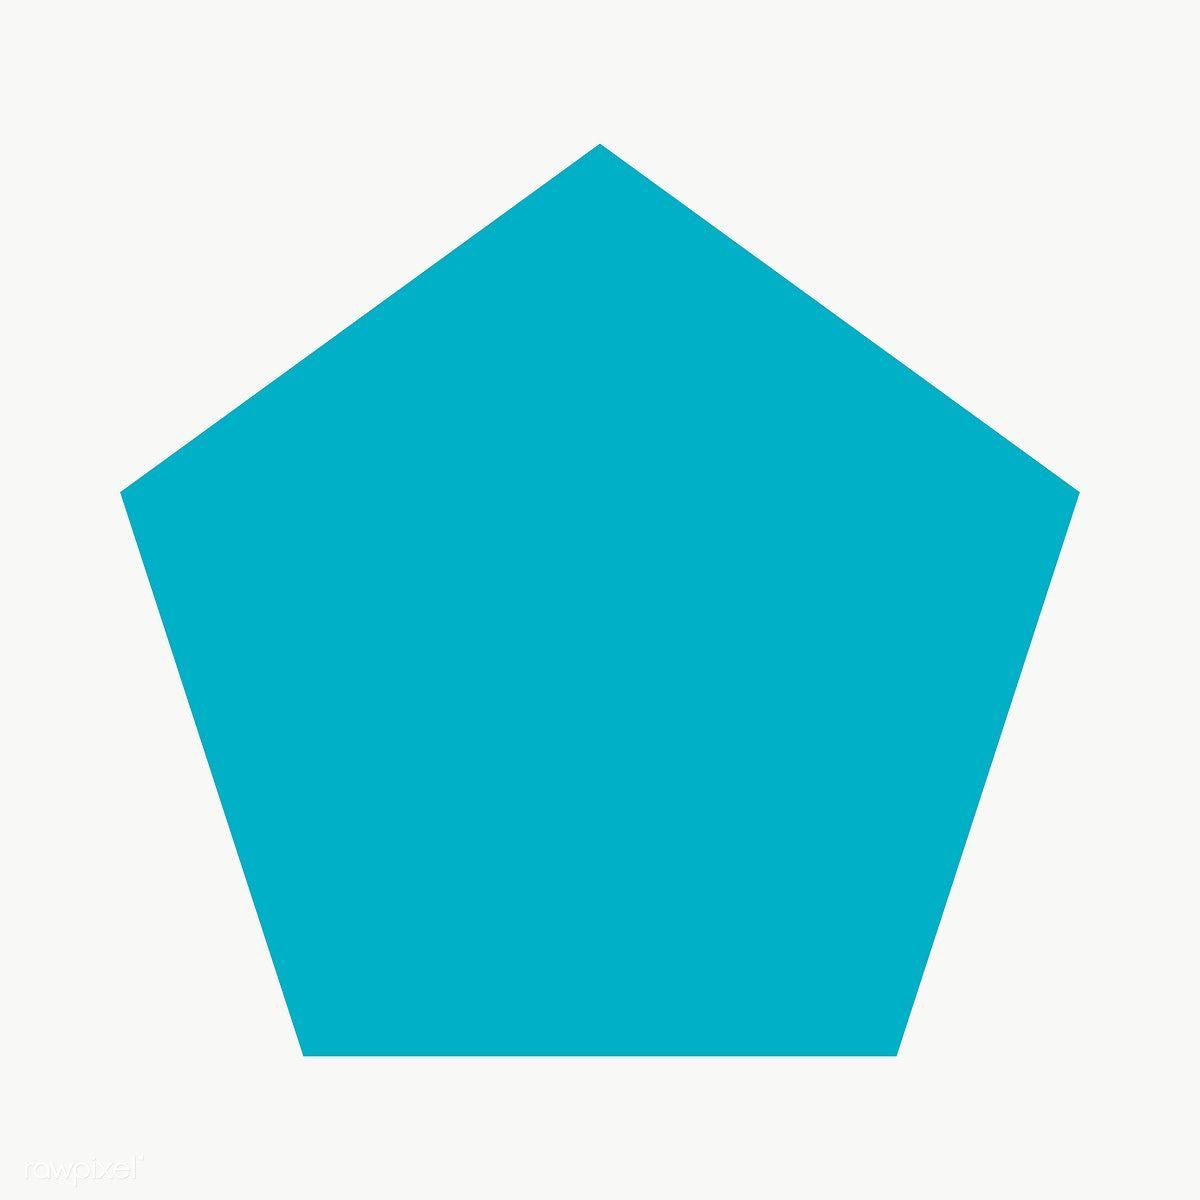 Blue Pentagon Geometric Shape Transparent Png Free Image By Rawpixel Com Ningzk V Geometric Shapes Printable Designs Geometric